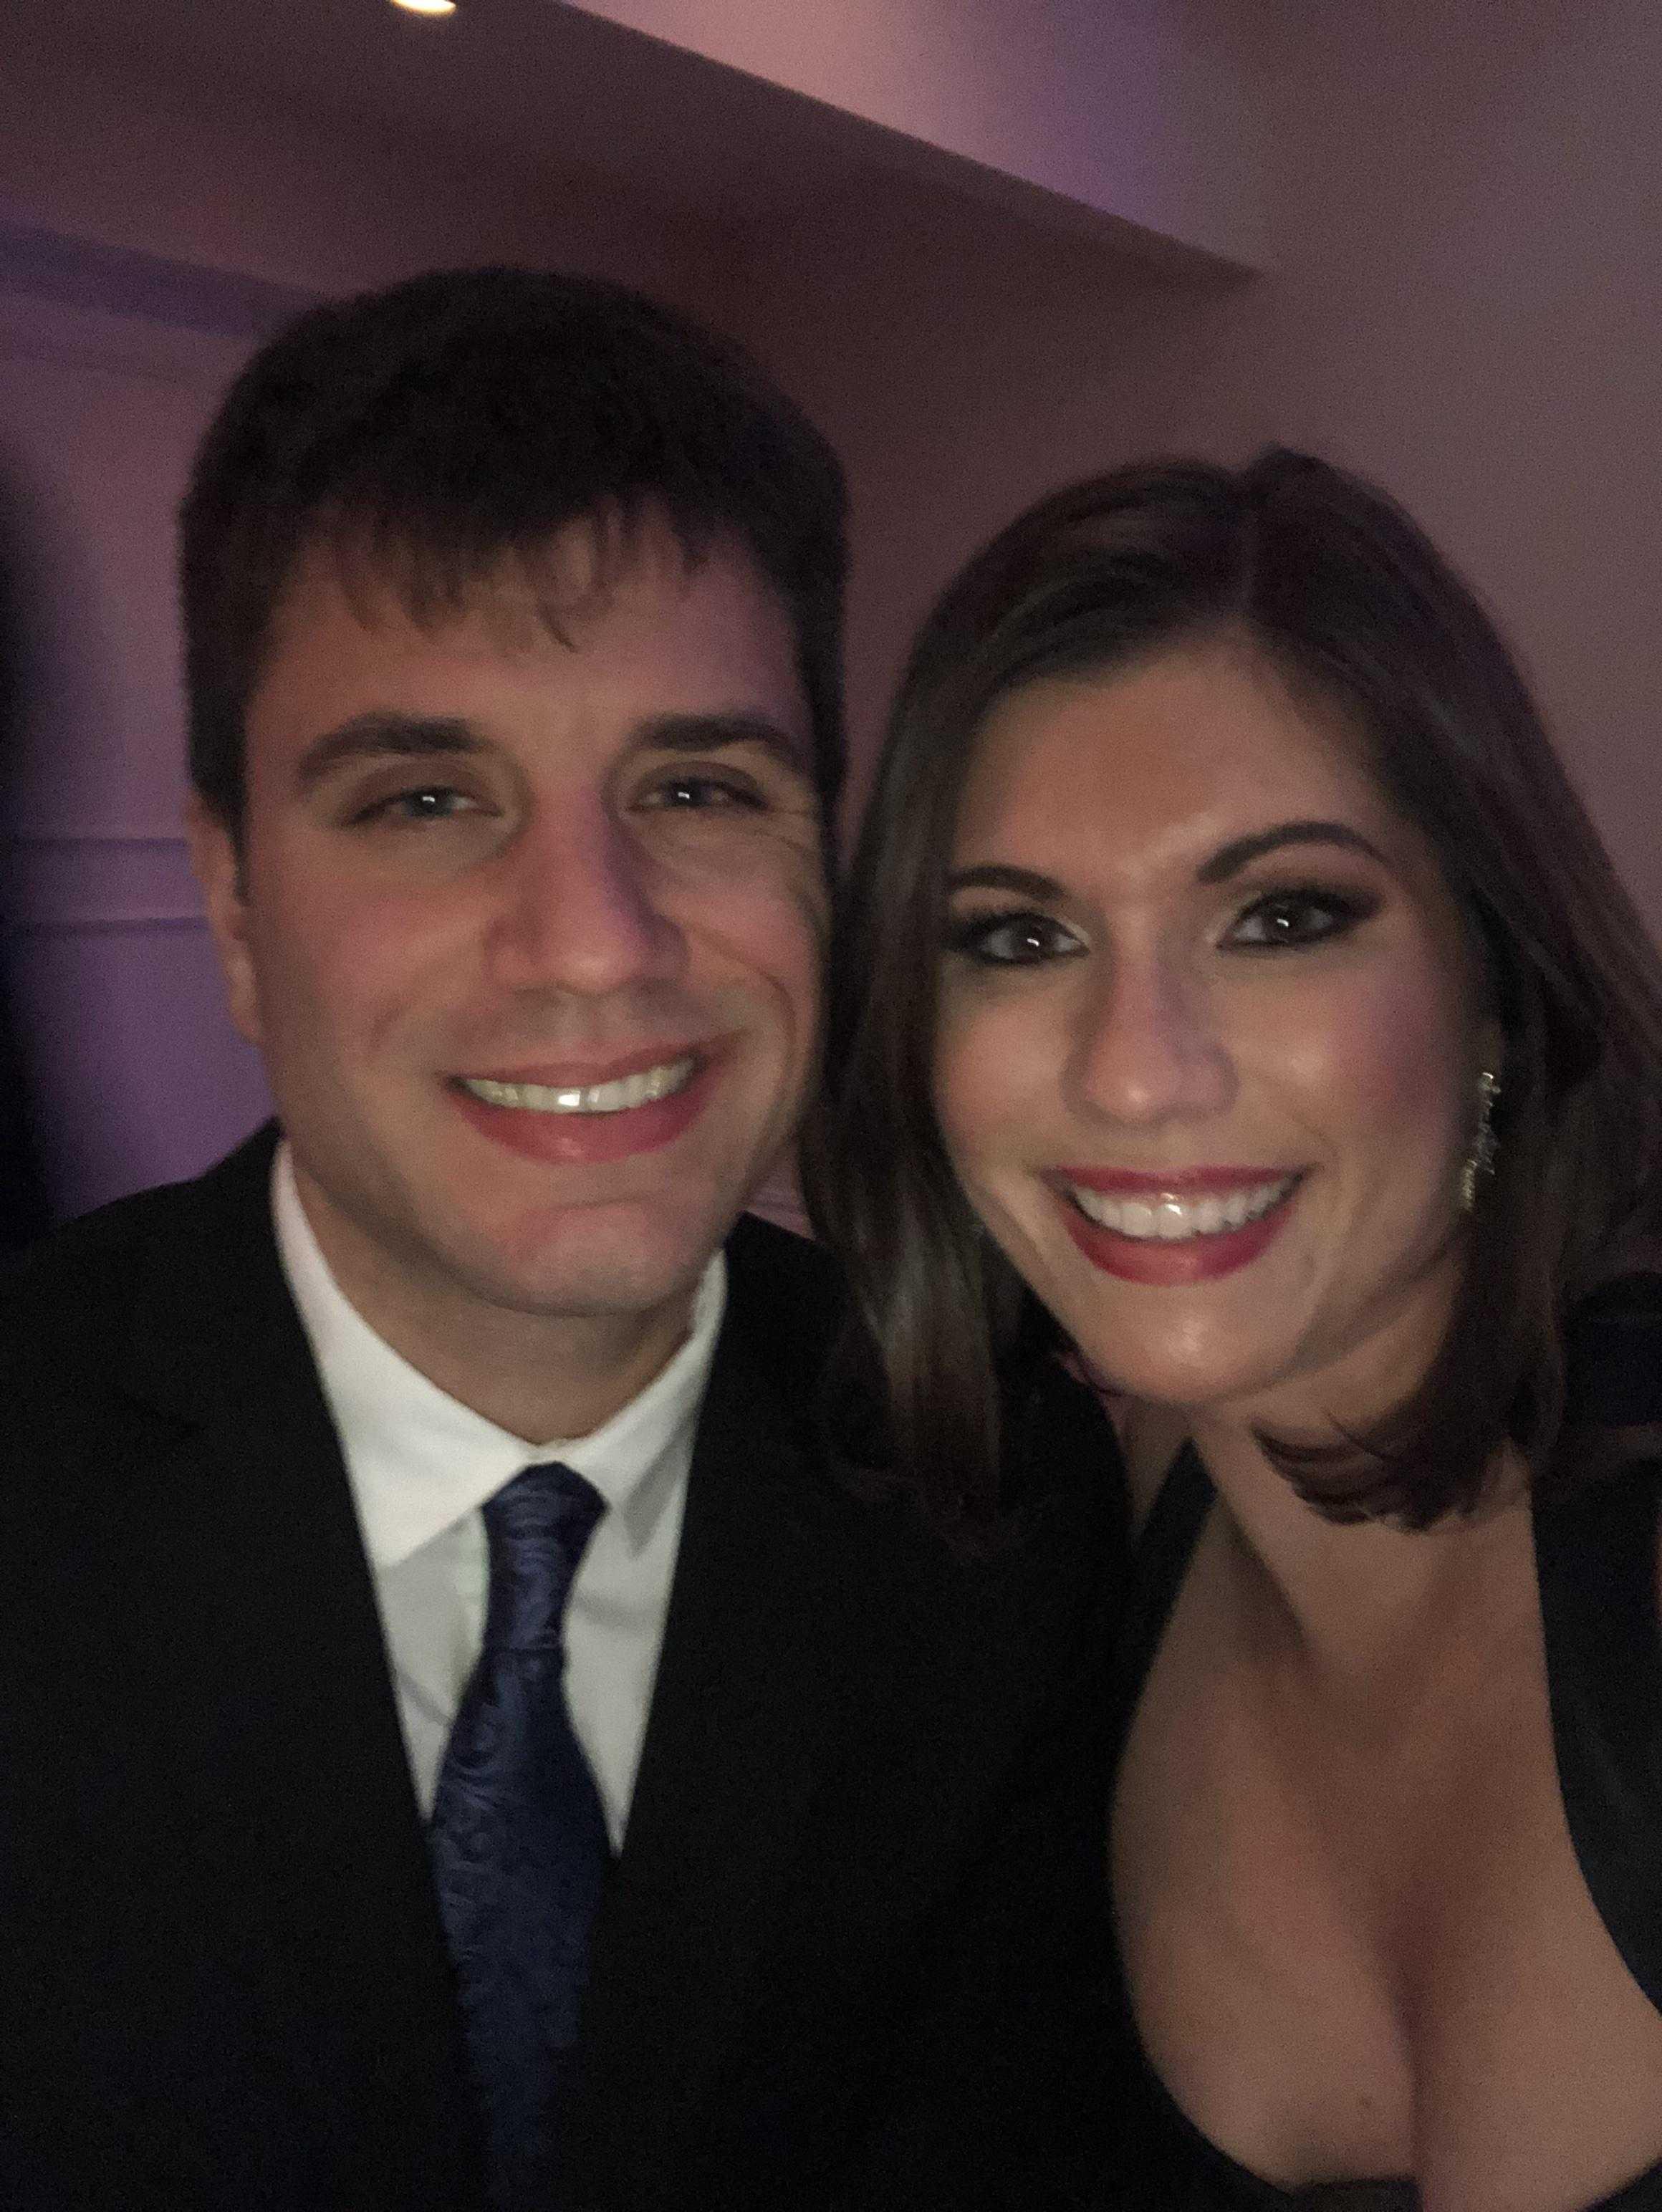 Michelle Price & David Price's Baby Registry | buybuy BABY